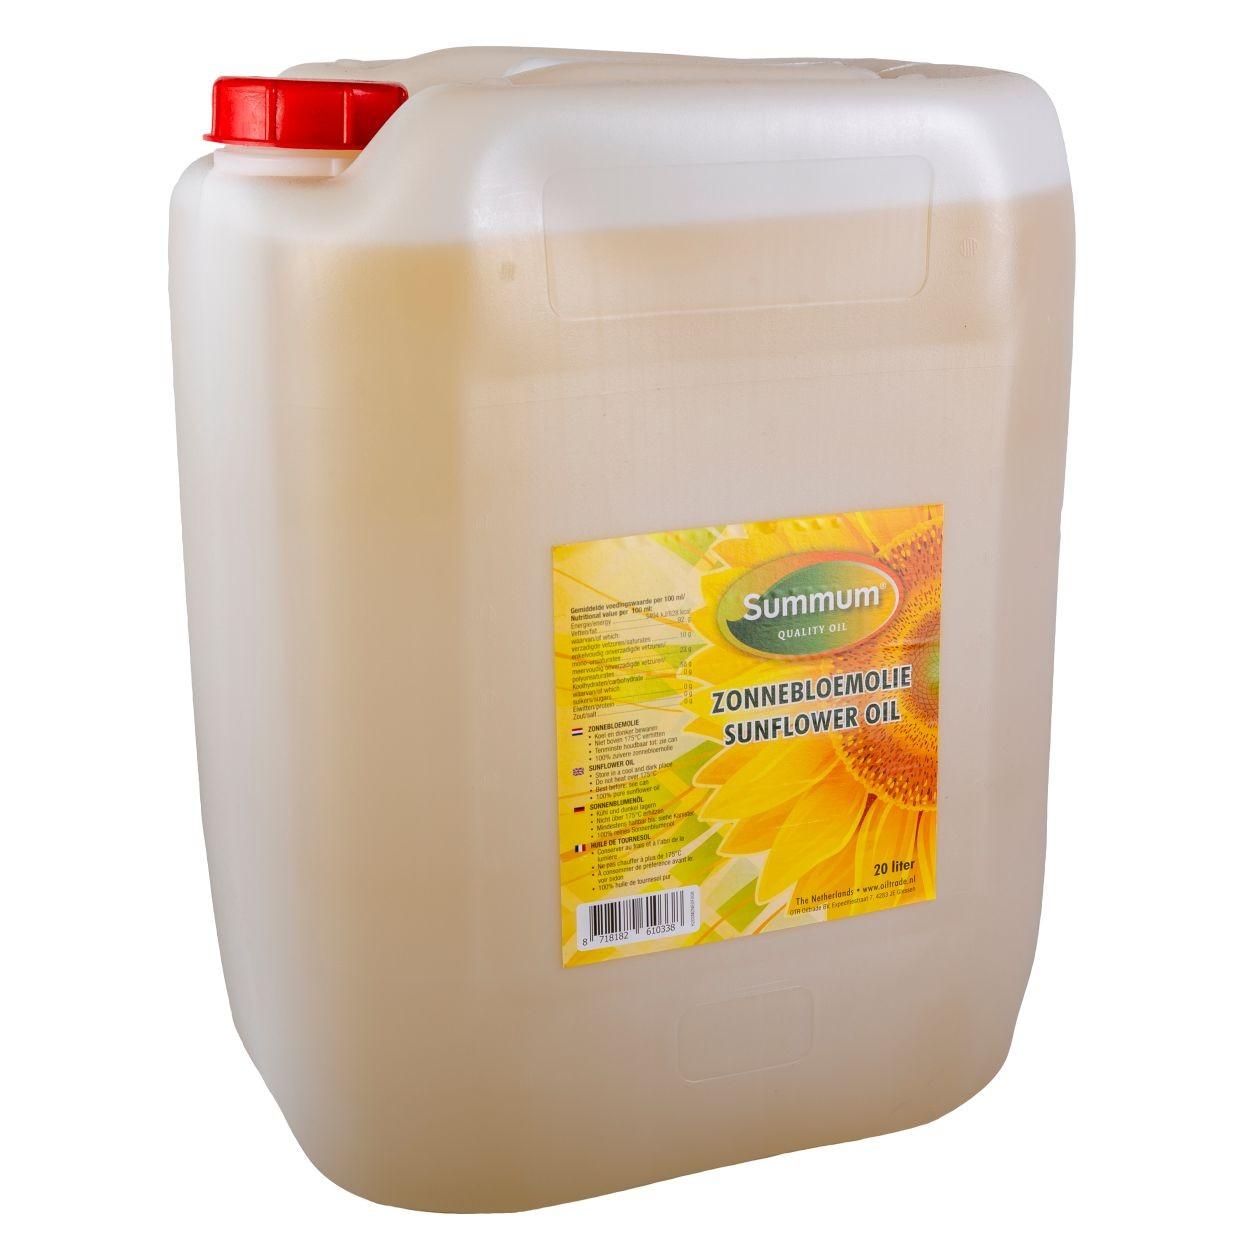 Zonnebloemolie jerrycan 20ltr. Summum